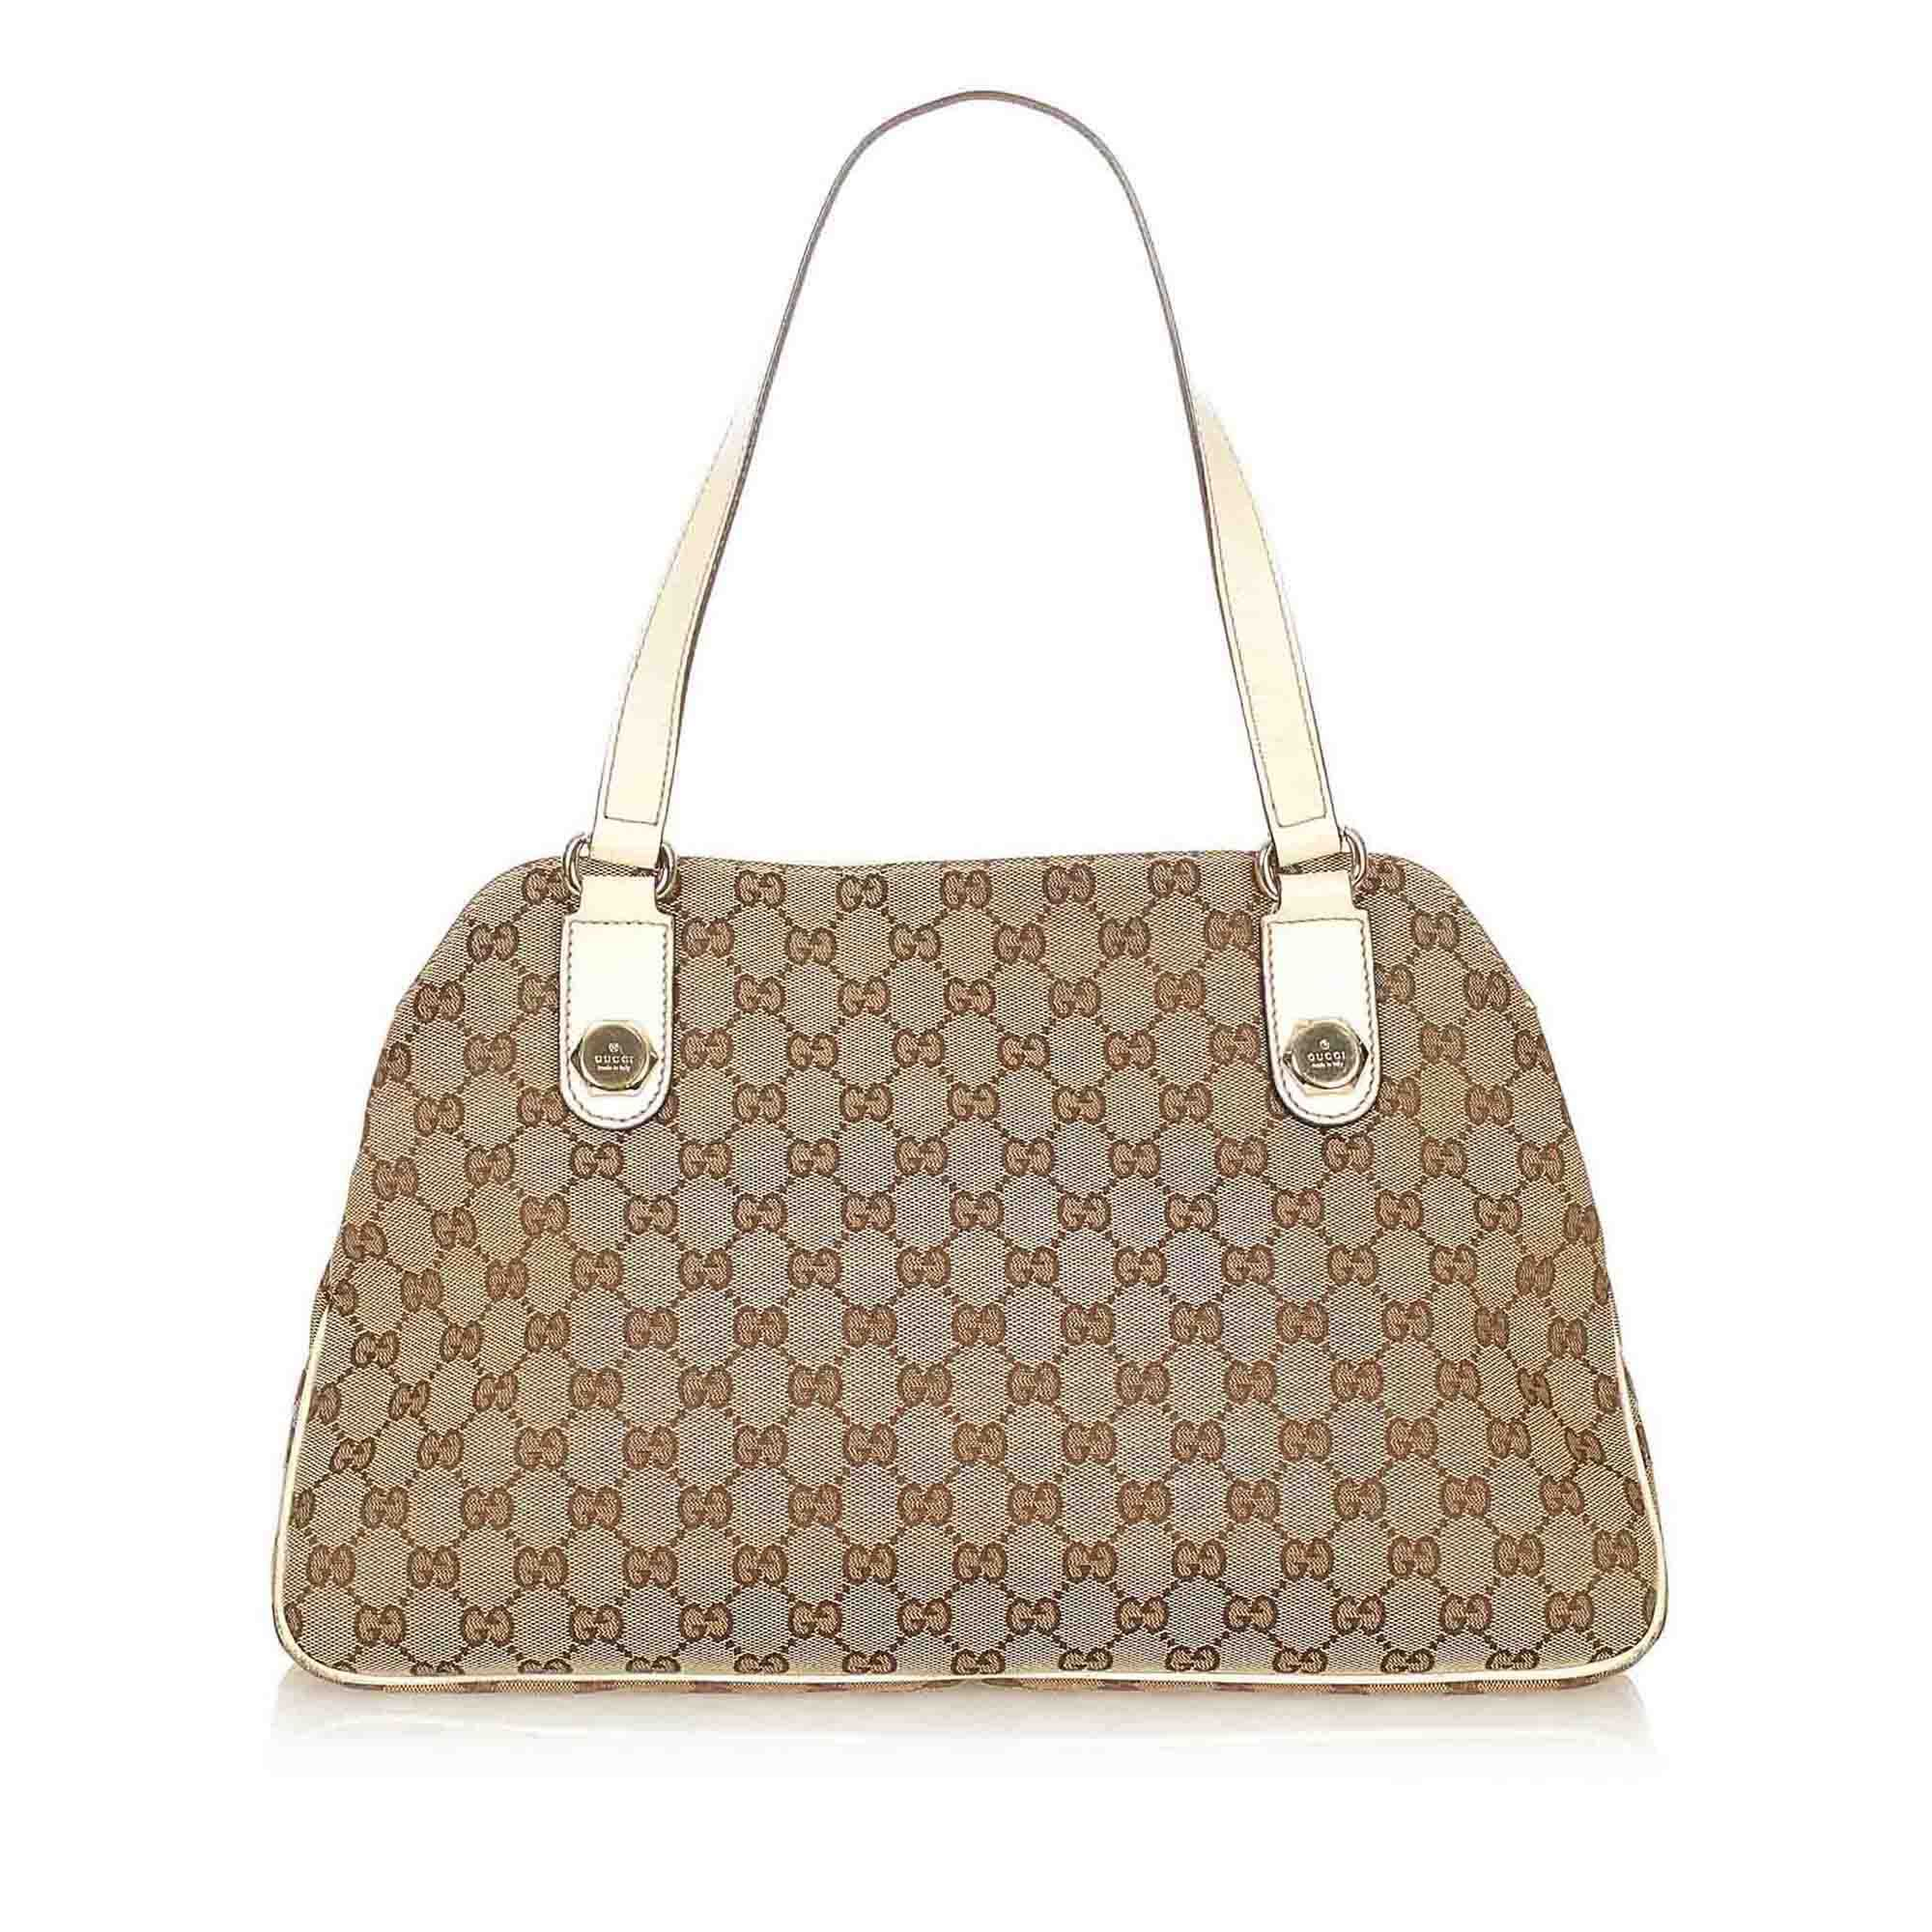 Vintage Gucci GG Canvas Charmy Shoulder Bag Brown